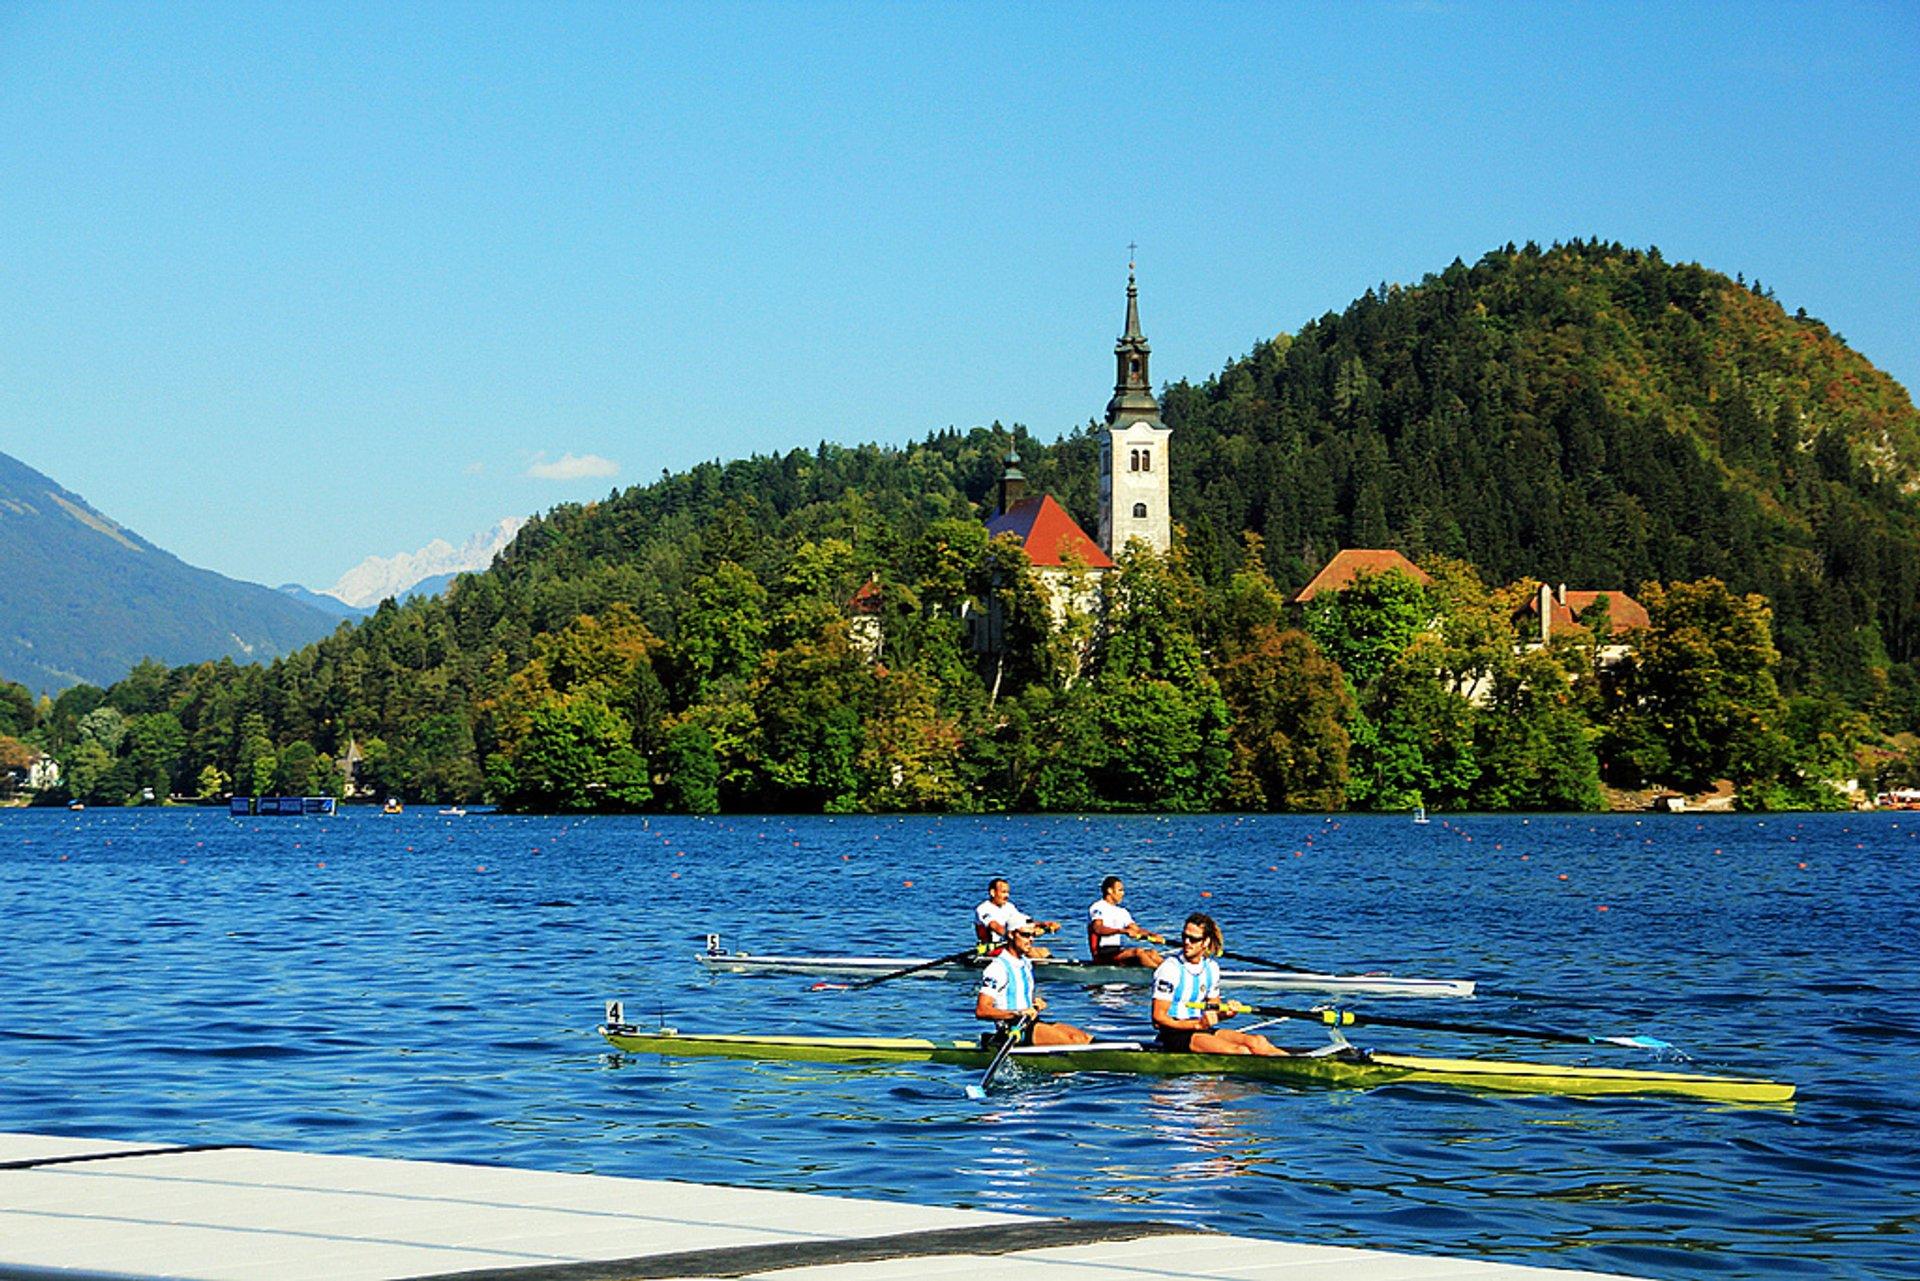 International Rowing Regatta in Slovenia 2020 - Best Time